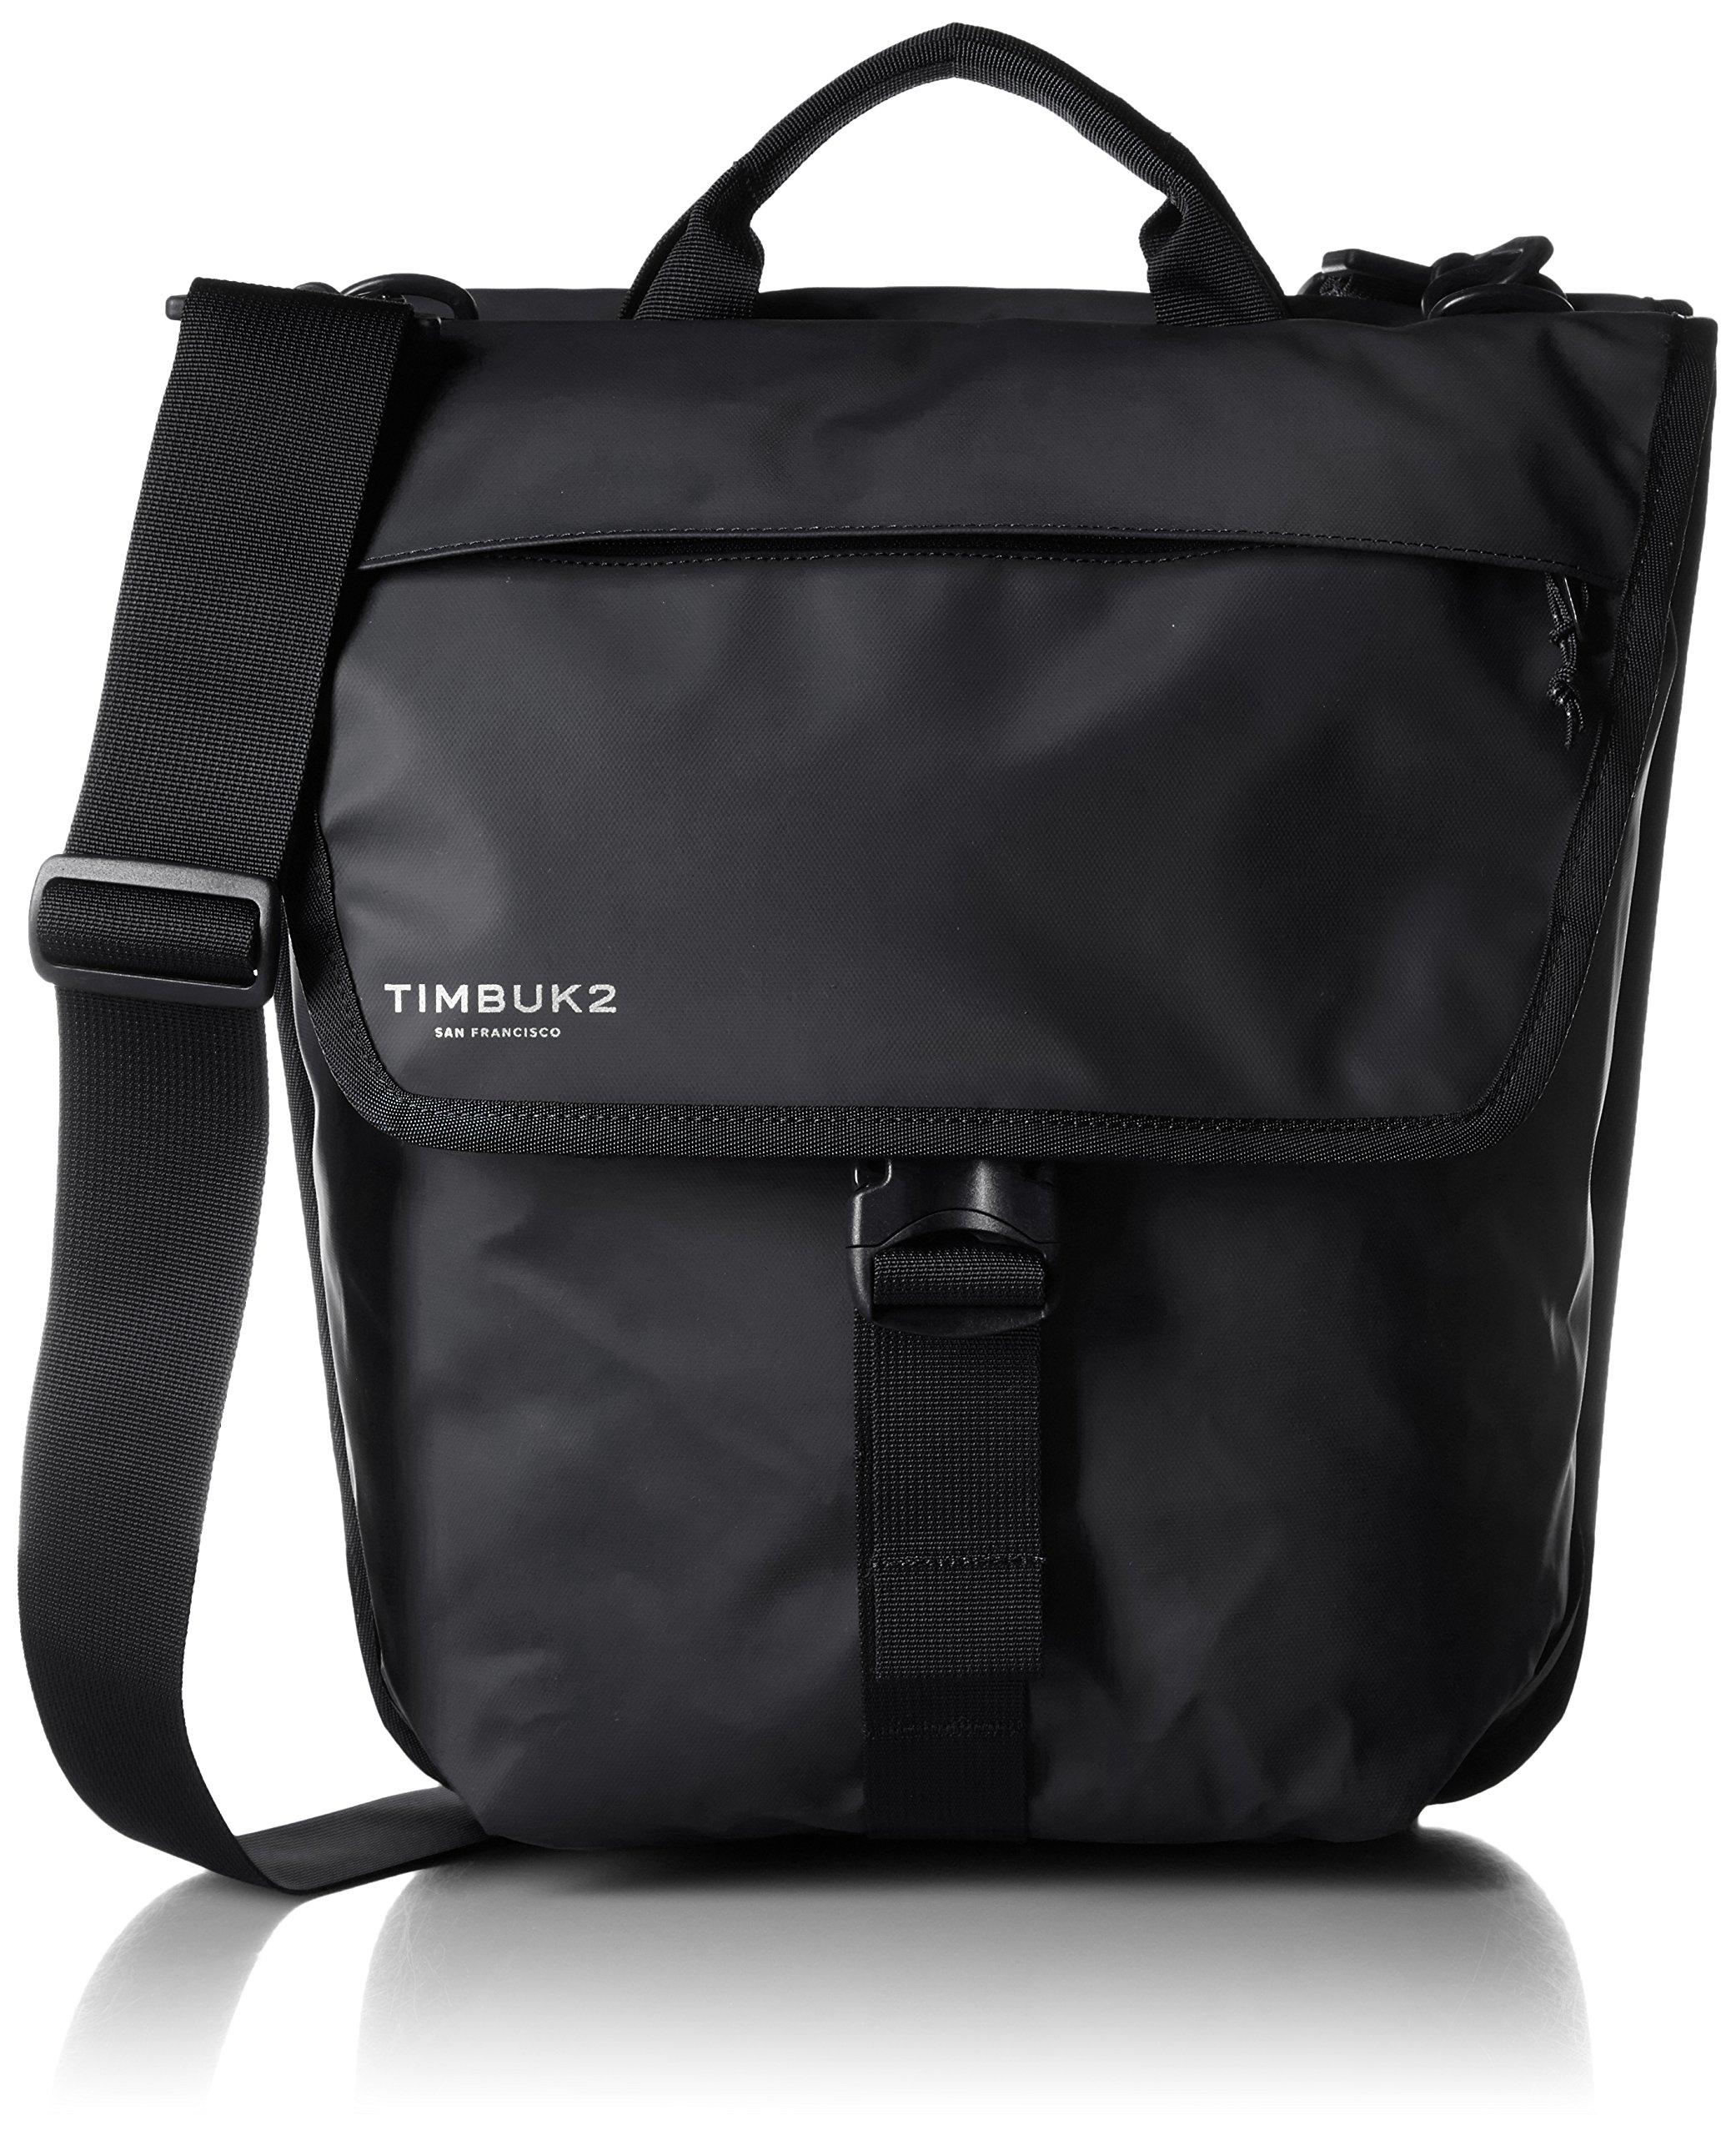 Timbuk2 Tandem Pannier, Jet Black